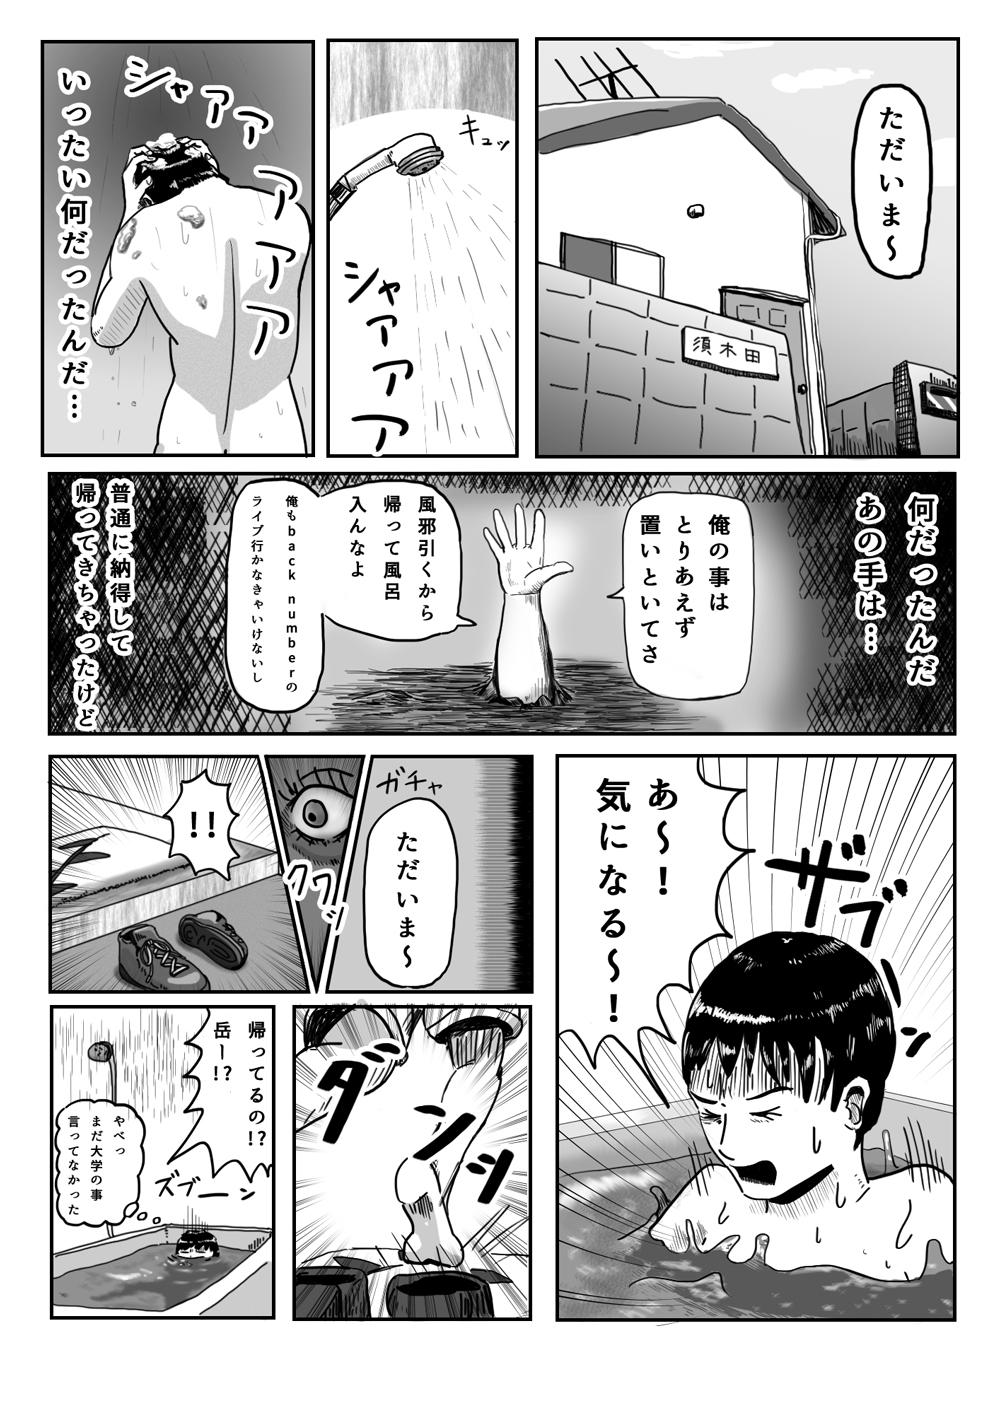 arnolds-hasegawa-003-1